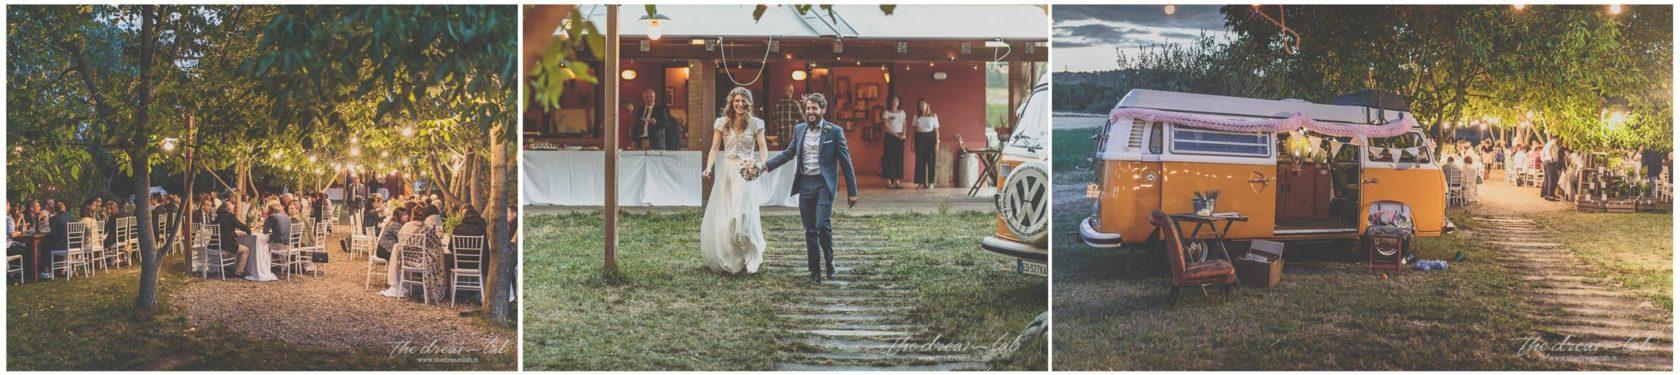 lalongarola-matrimoni-web